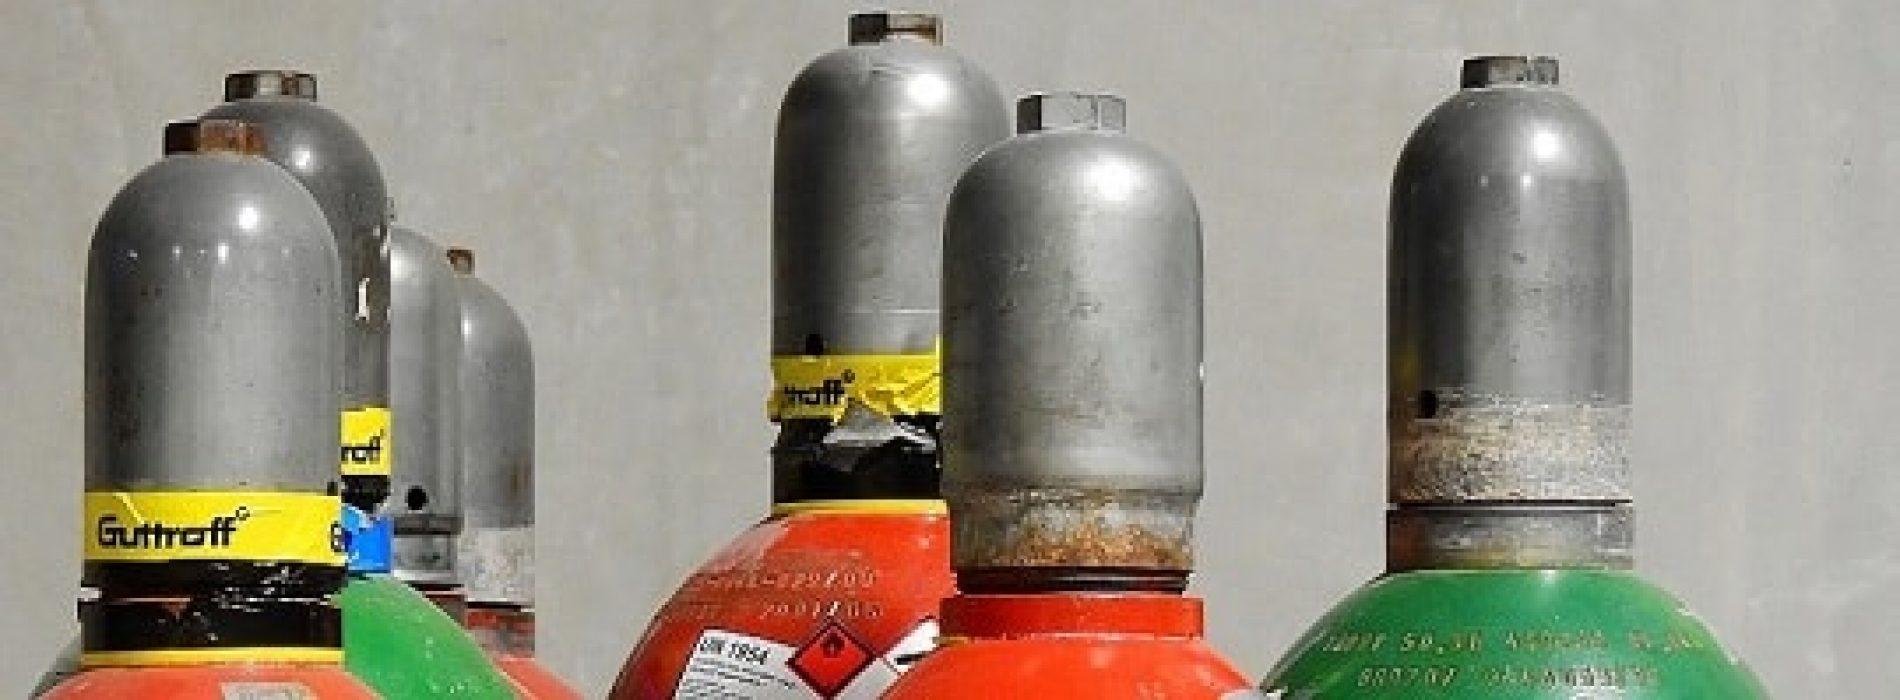 Slik oppbevarer du gassflasker